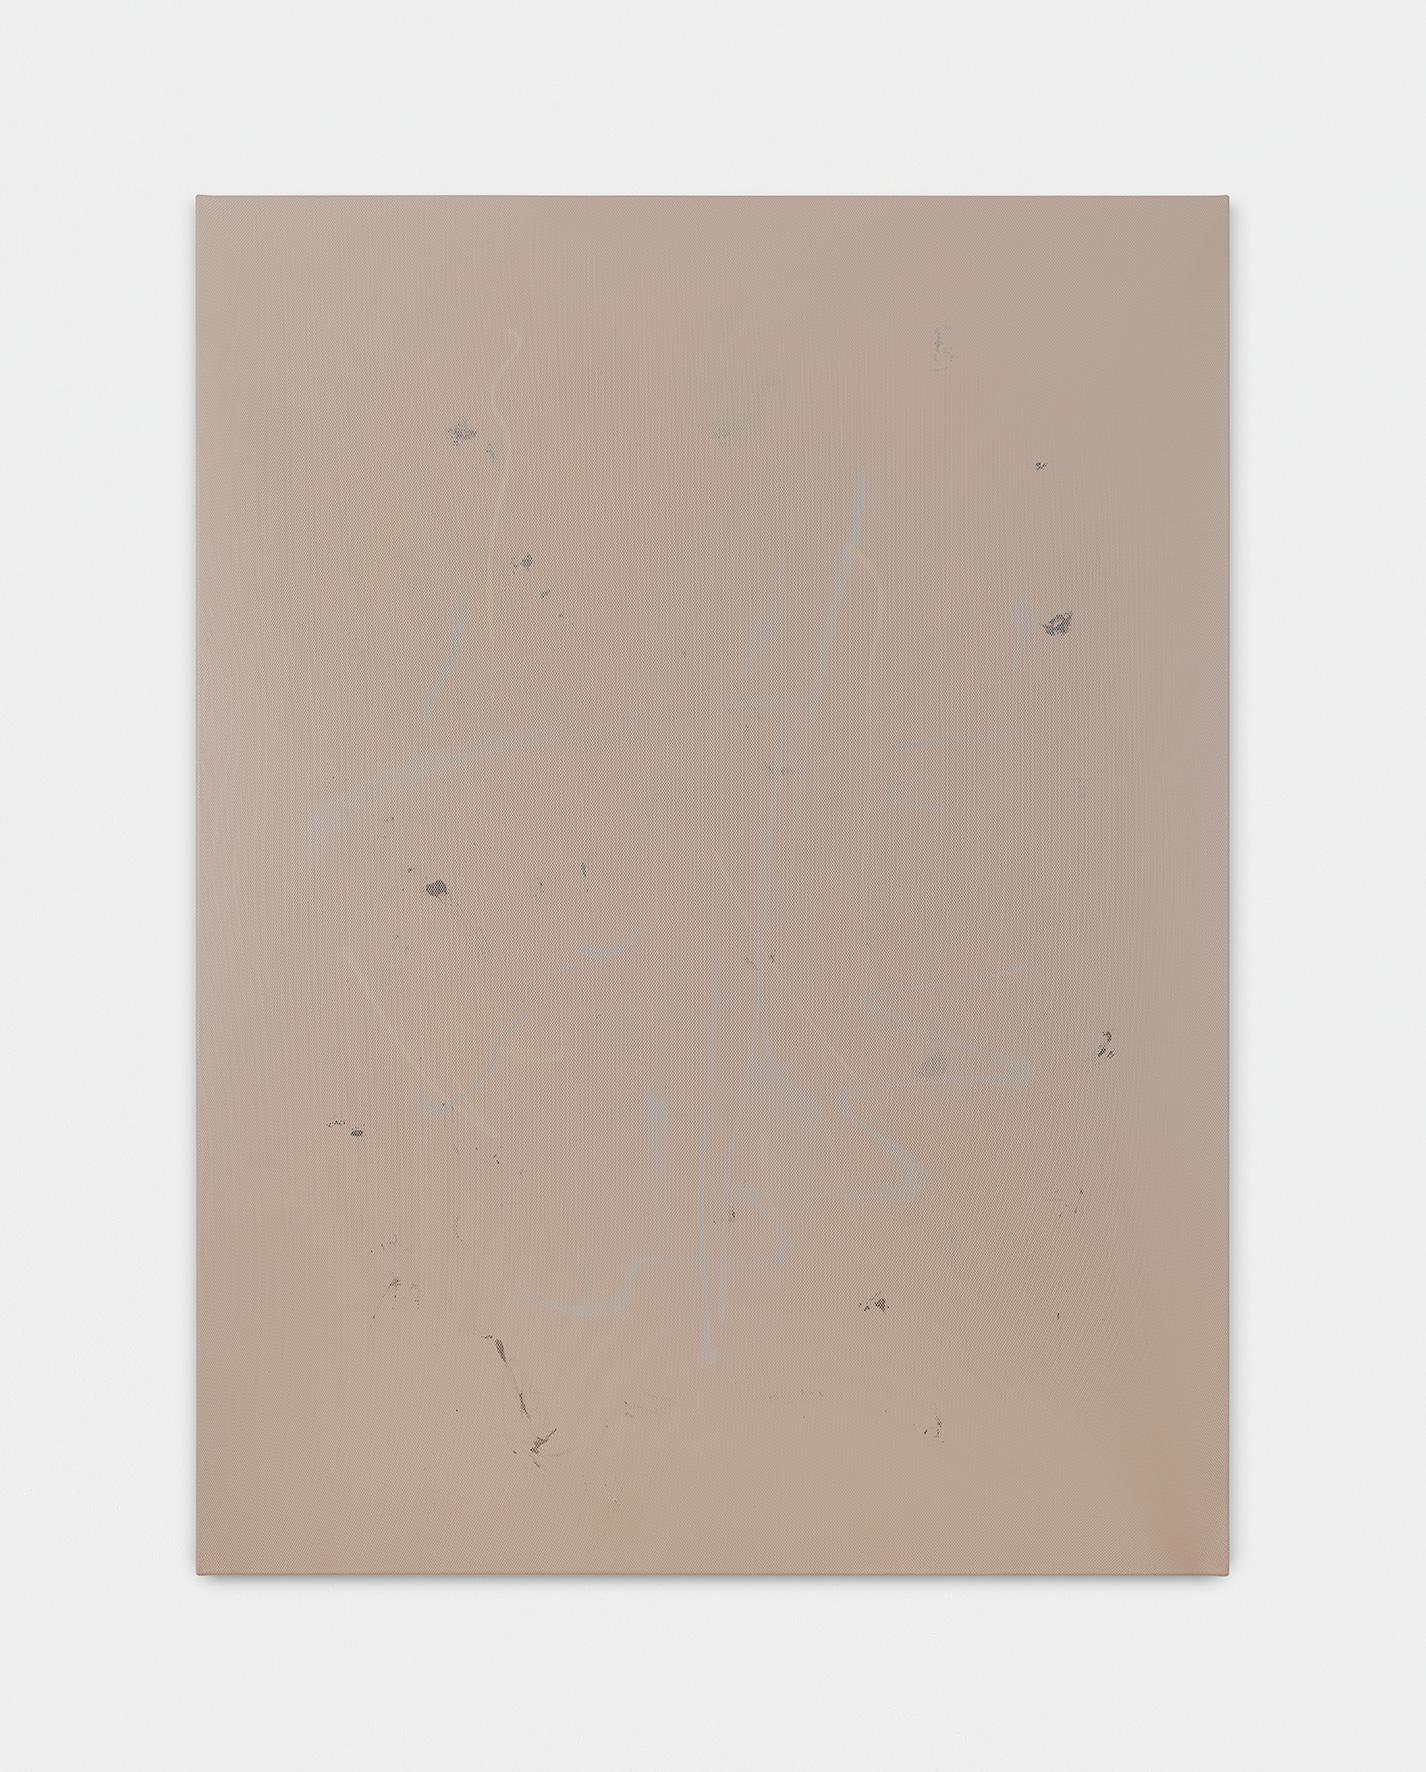 190203 | 2019 | Acryl, Lack, Mesh Gewebe auf Leinwand | 160 x 120 cm | ©GALERIE ALBER